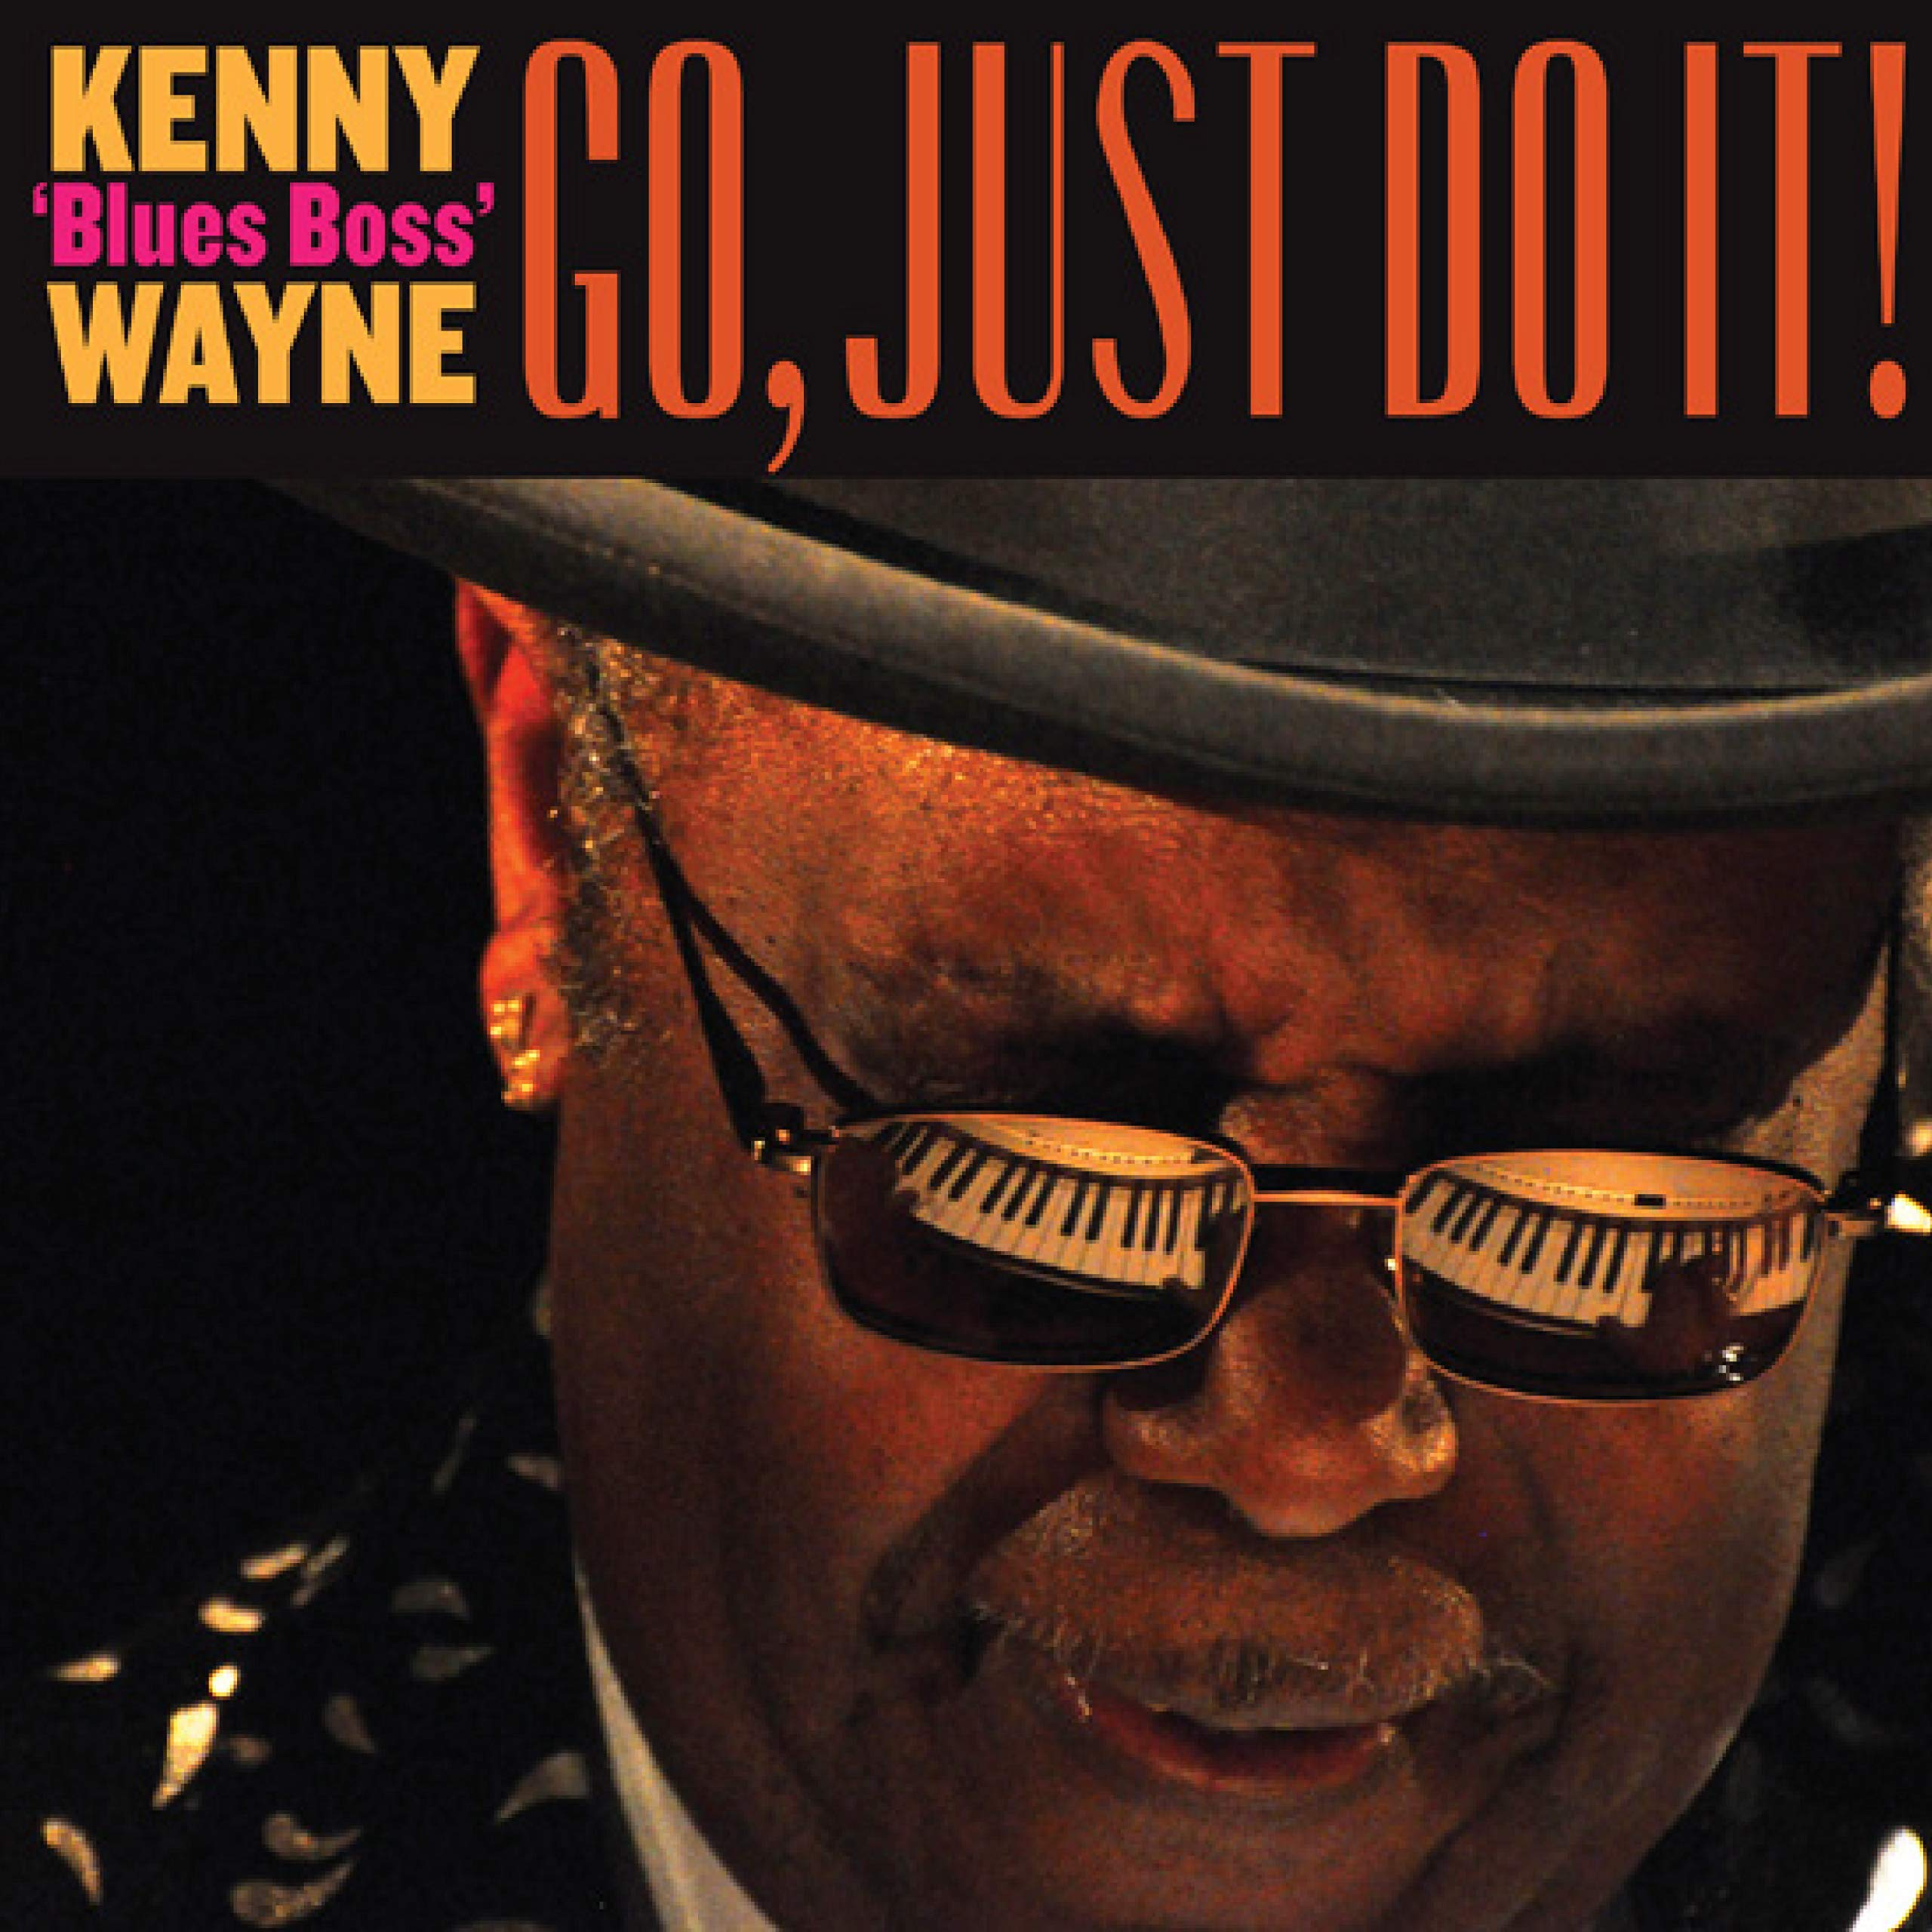 Kenny 'Blues Boss' Wayne - Go, Just Do It! (2020) [FLAC] Download